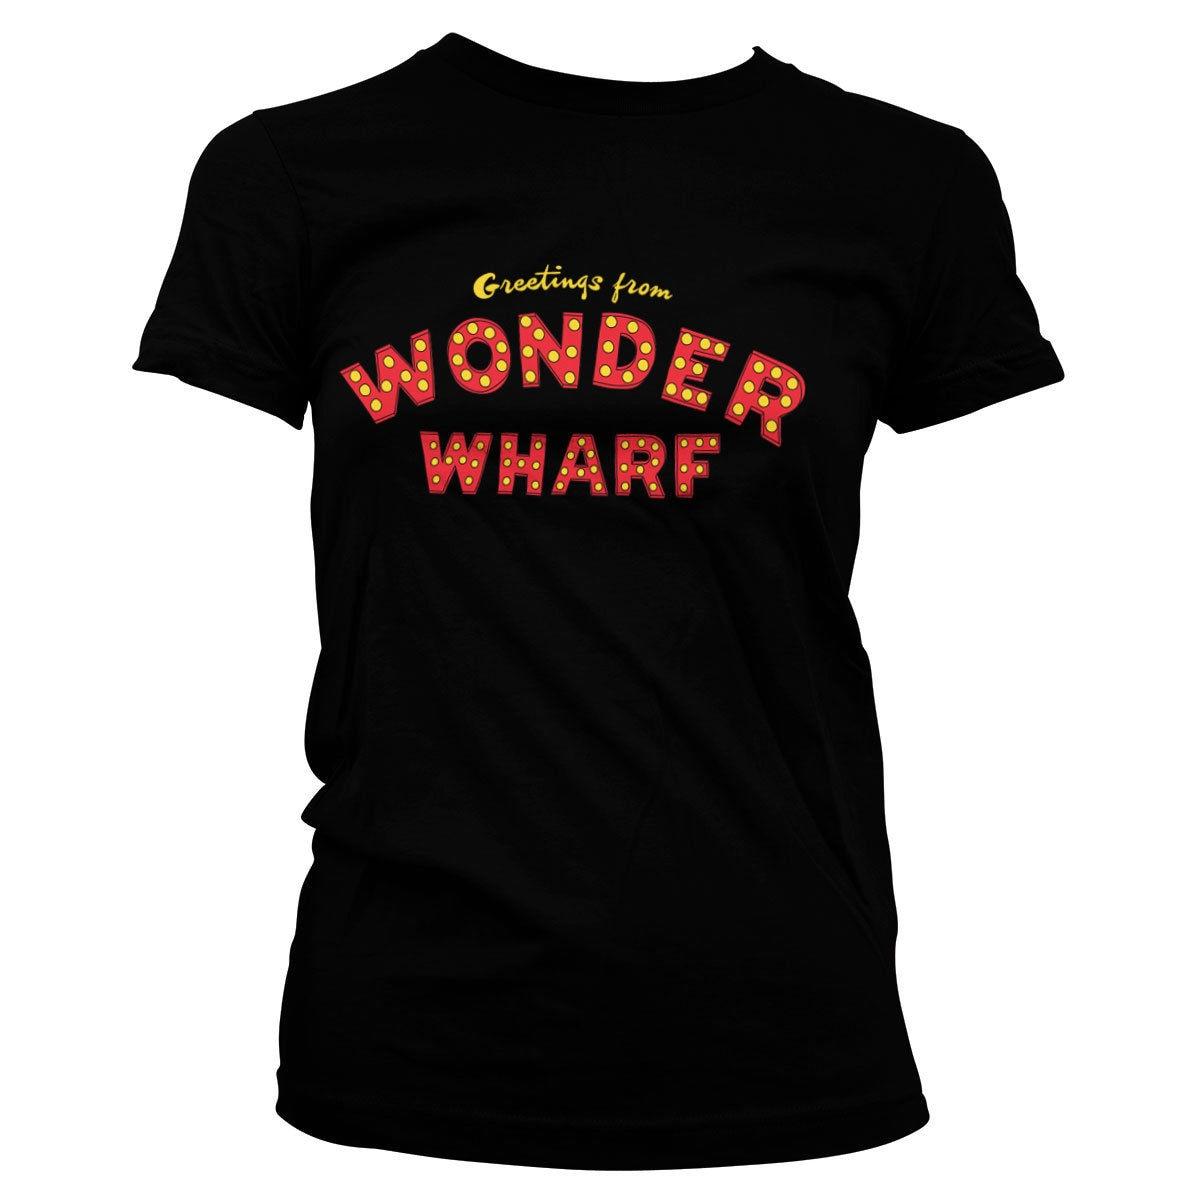 Wonder Wharf Womens T-Shirt S-XL Sizes Kawaii Printed T Shirt Women Cotton Female Print Fashion Tops Tee Clothing